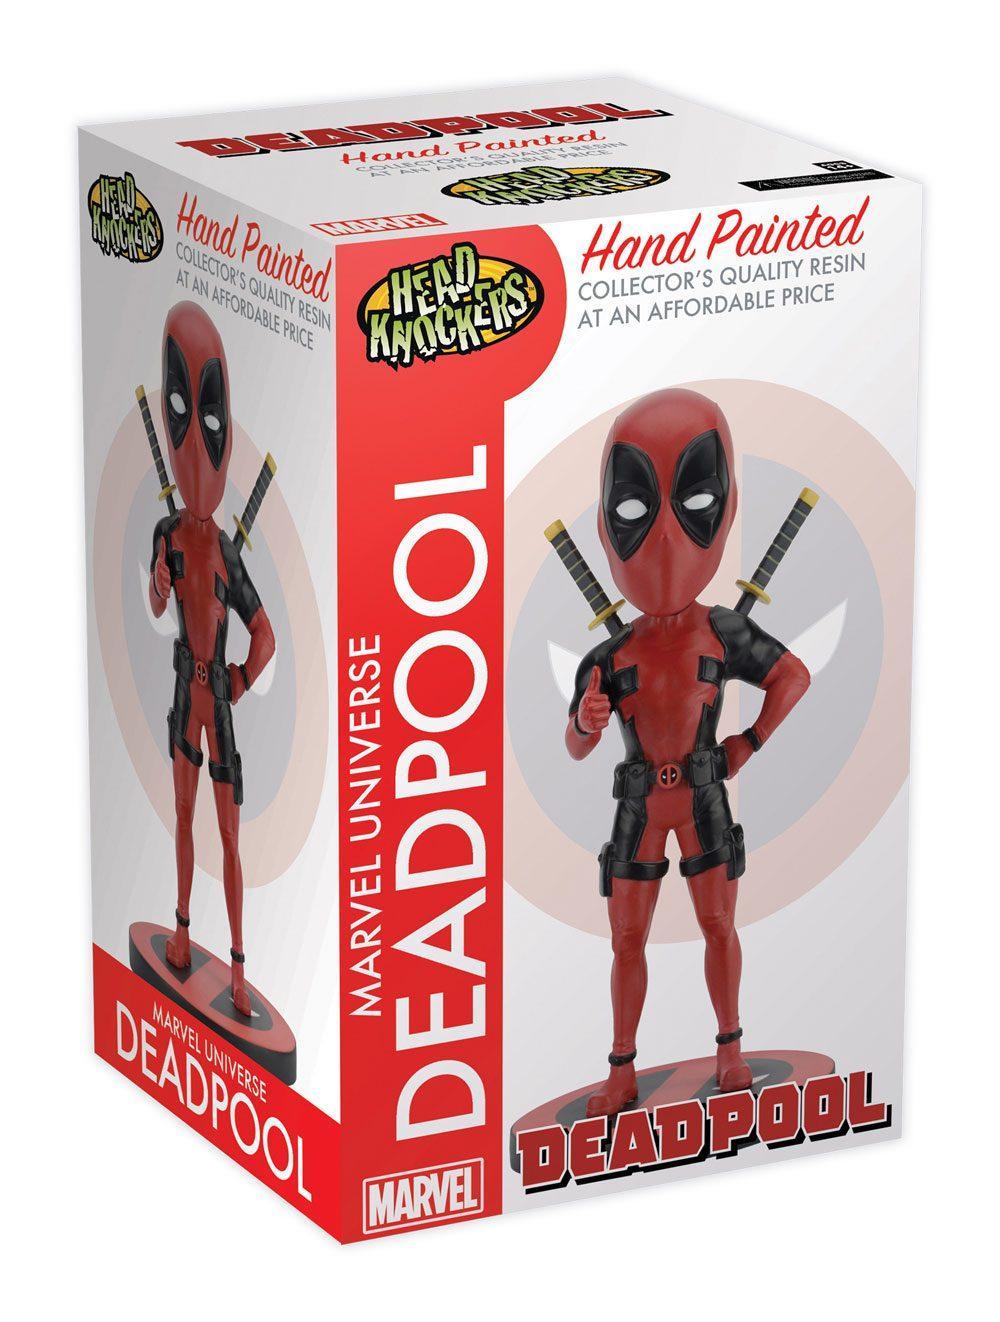 Deadpool bobbles head figurine neca 1